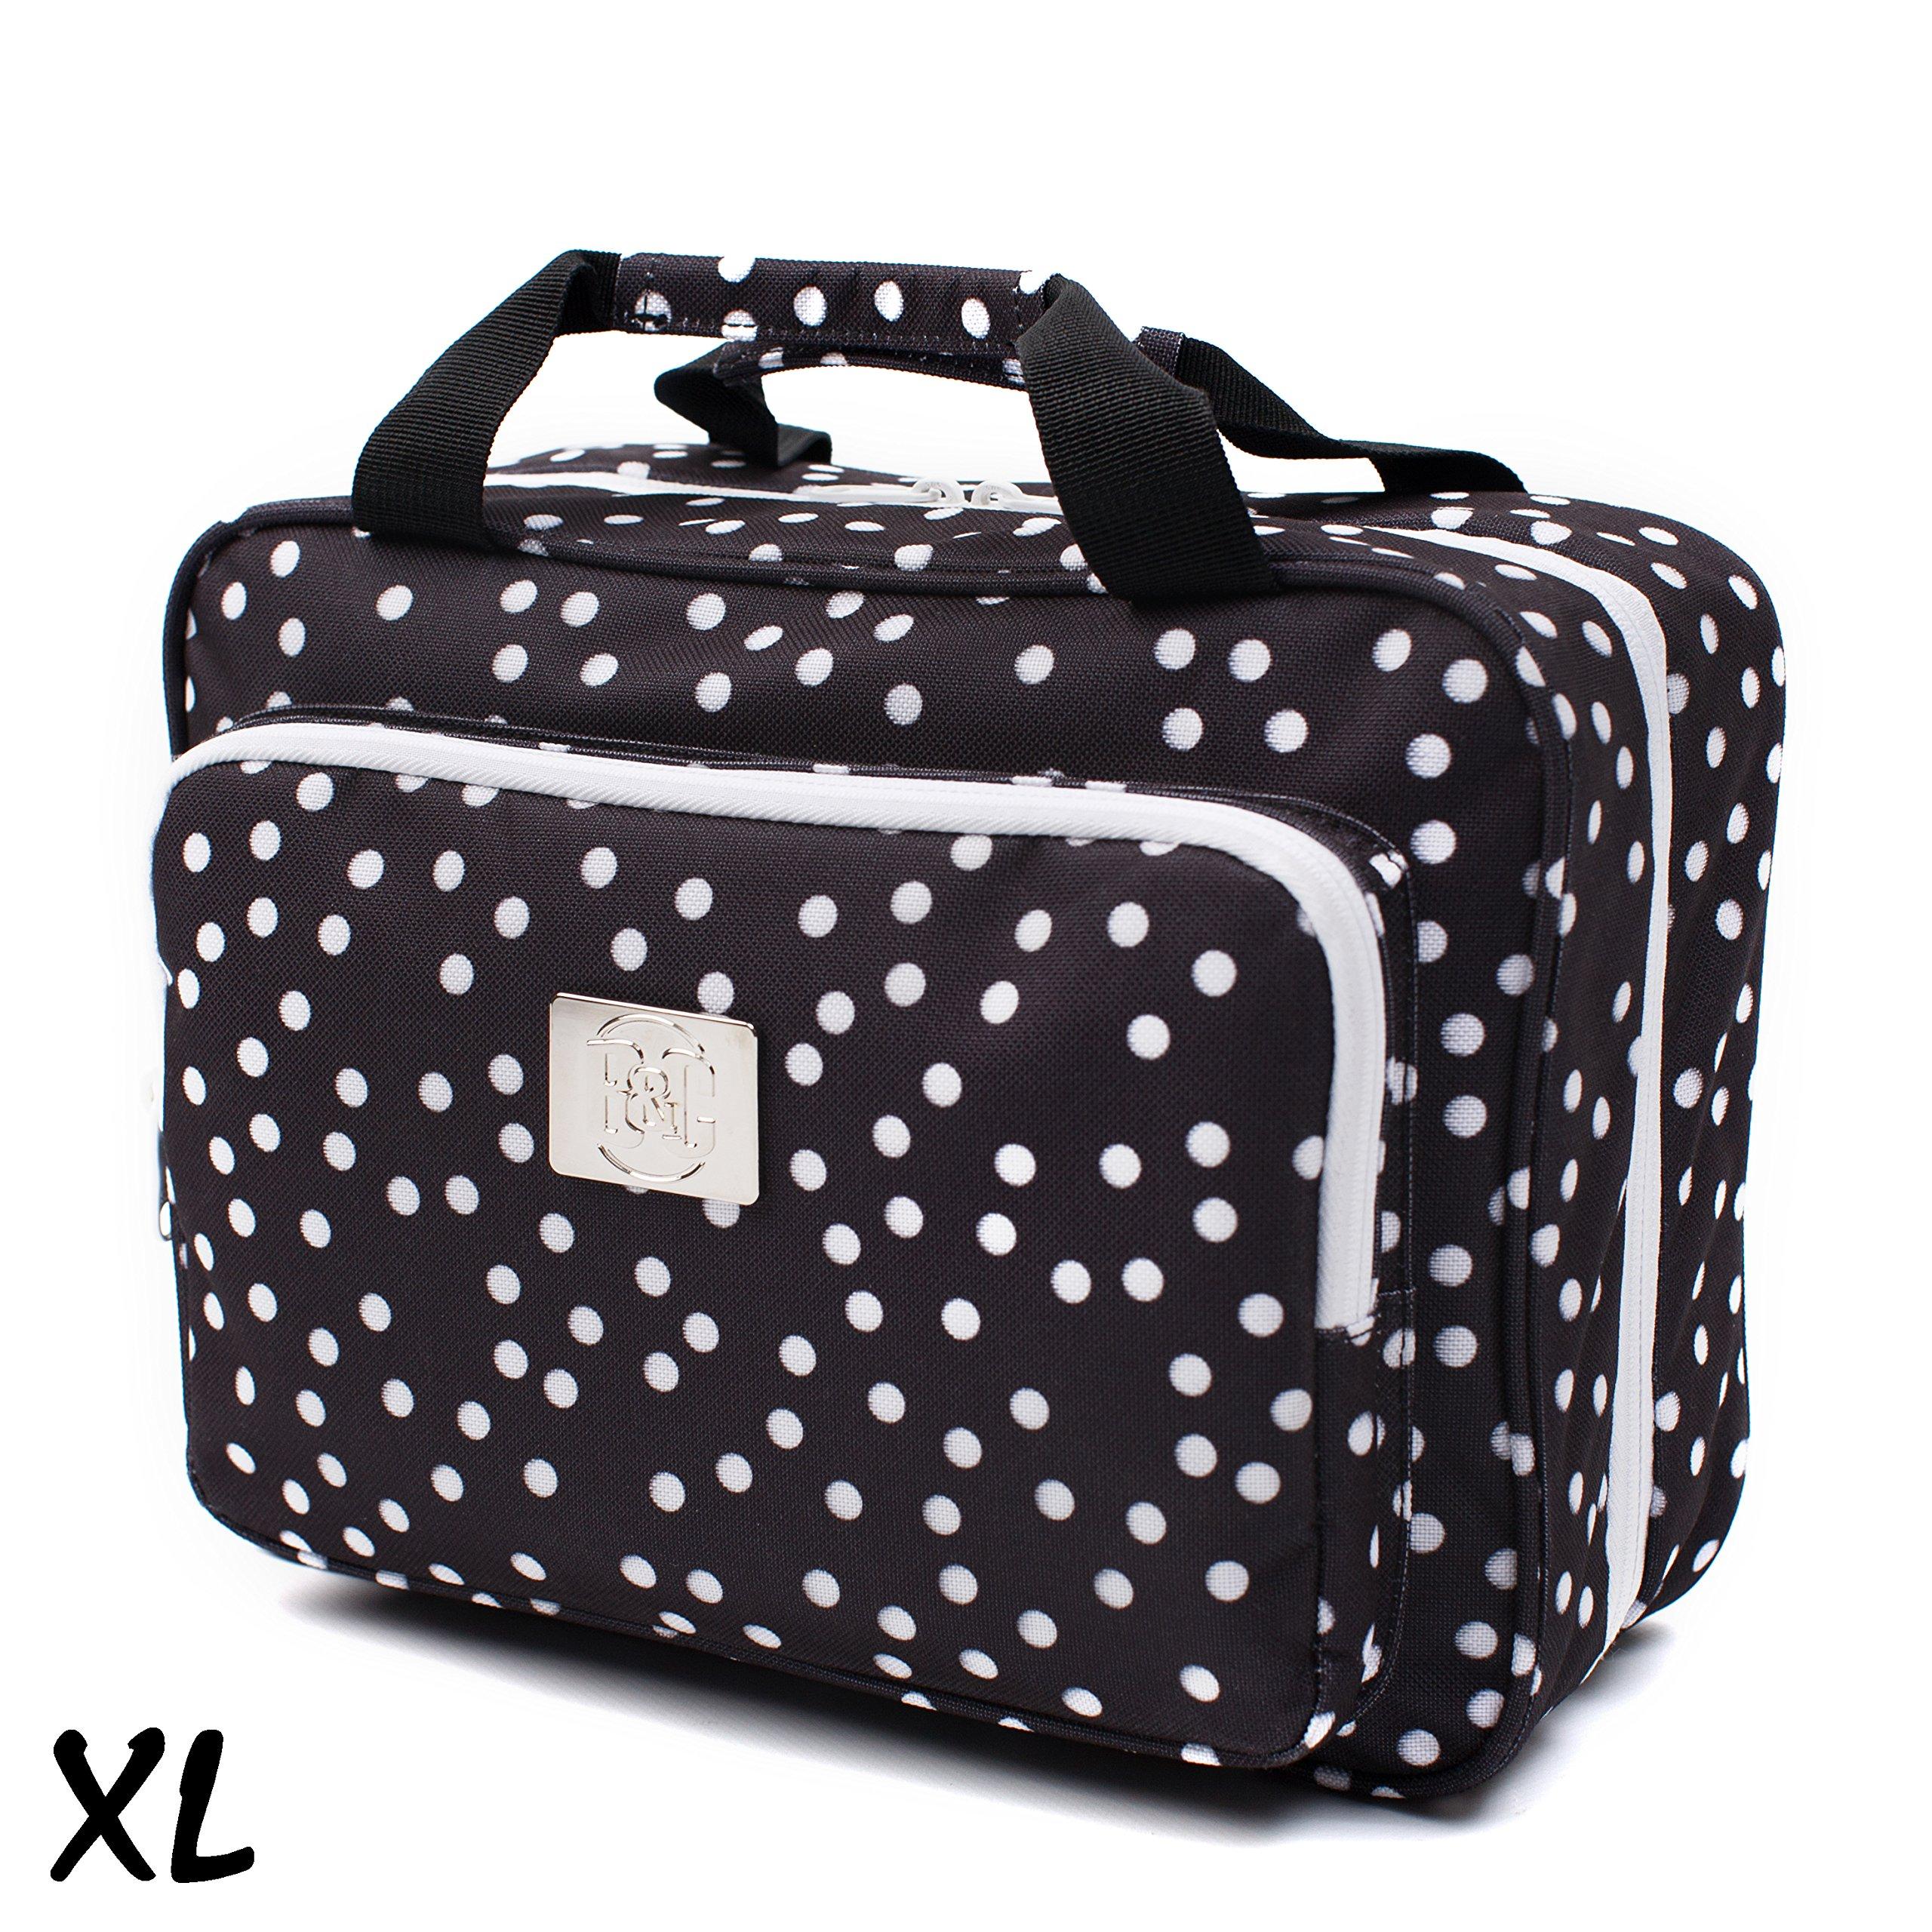 b9ecb75191 Large Versatile Travel Cosmetic Bag - Perfect Hanging Travel Toiletry  Organizer (XL Polka dot)